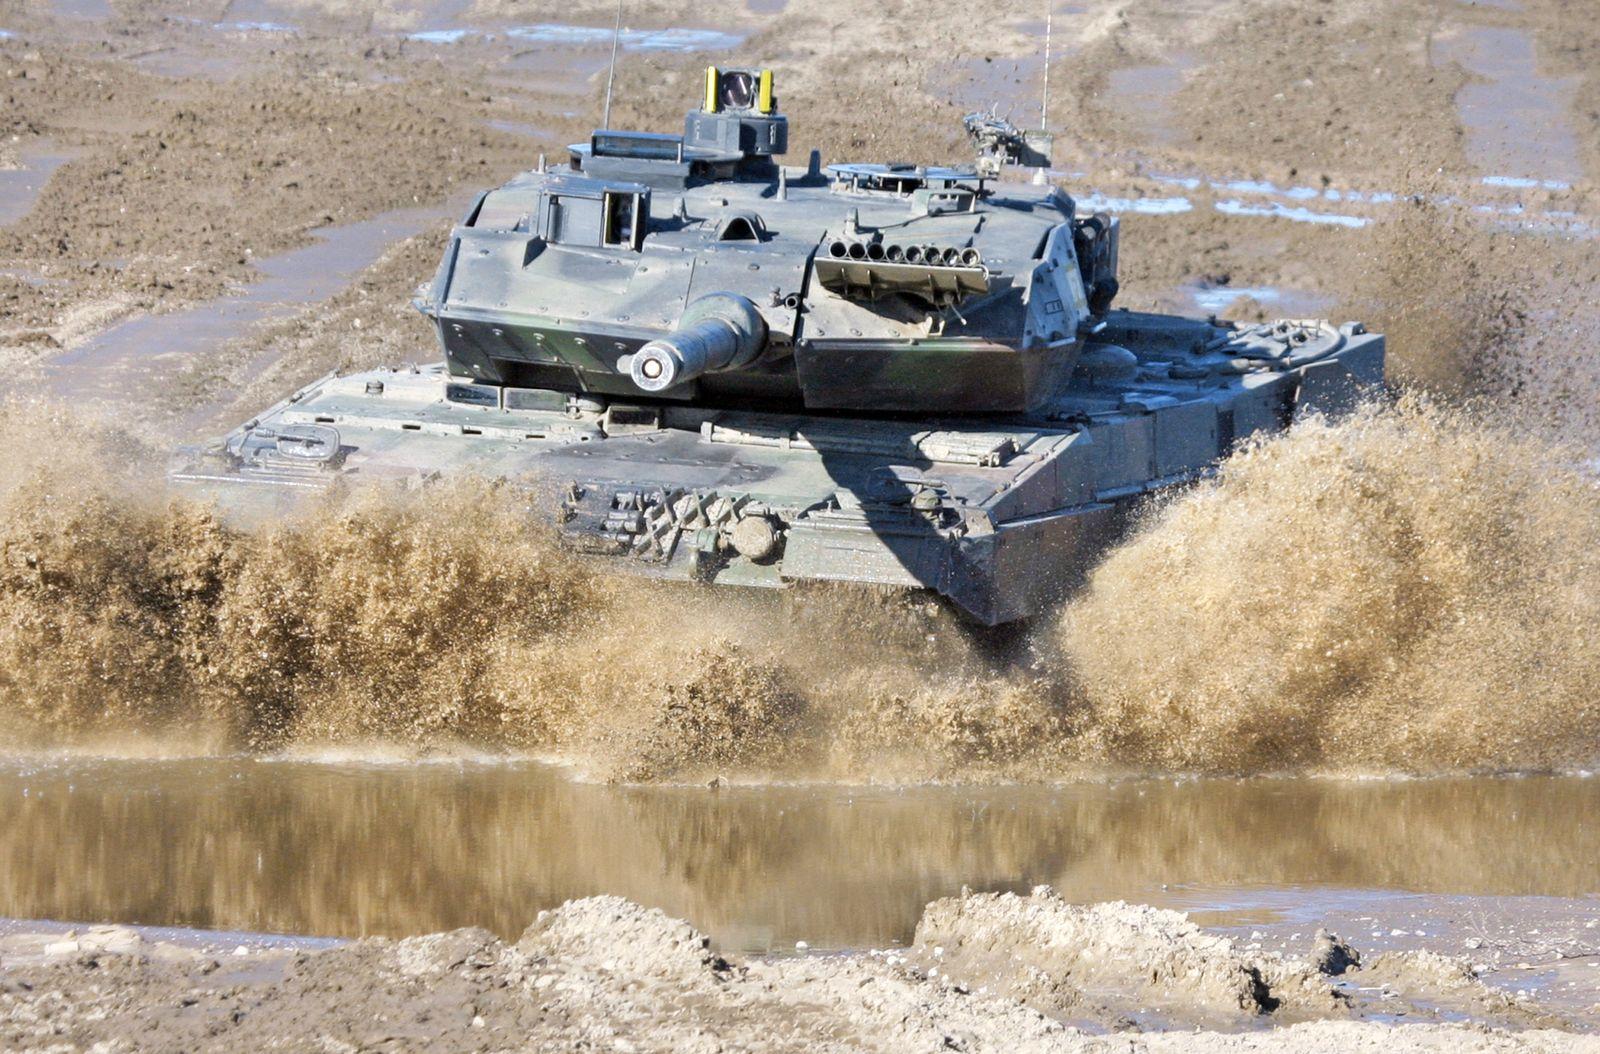 SP 28/2011 S. 23 Exporte für INTERNATIONAL Kampfpanzer Leopard 2